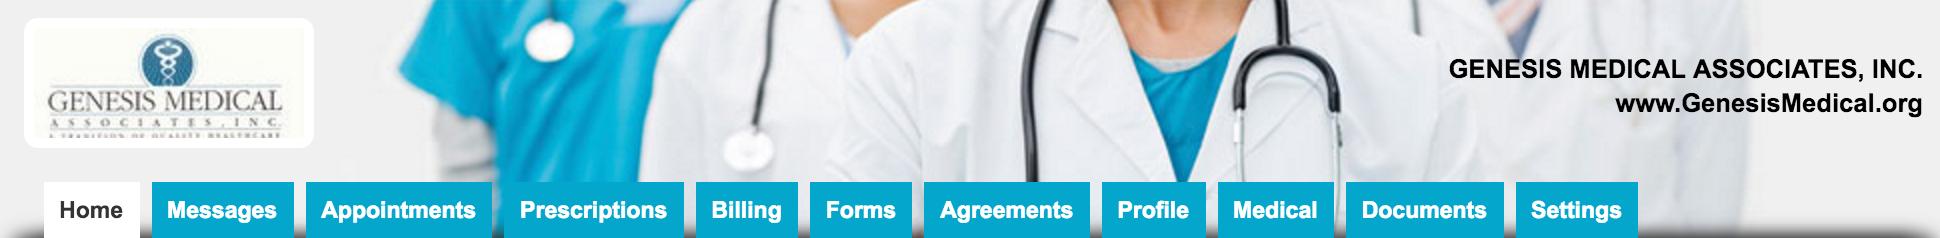 Genesis Medical's Patient Portal